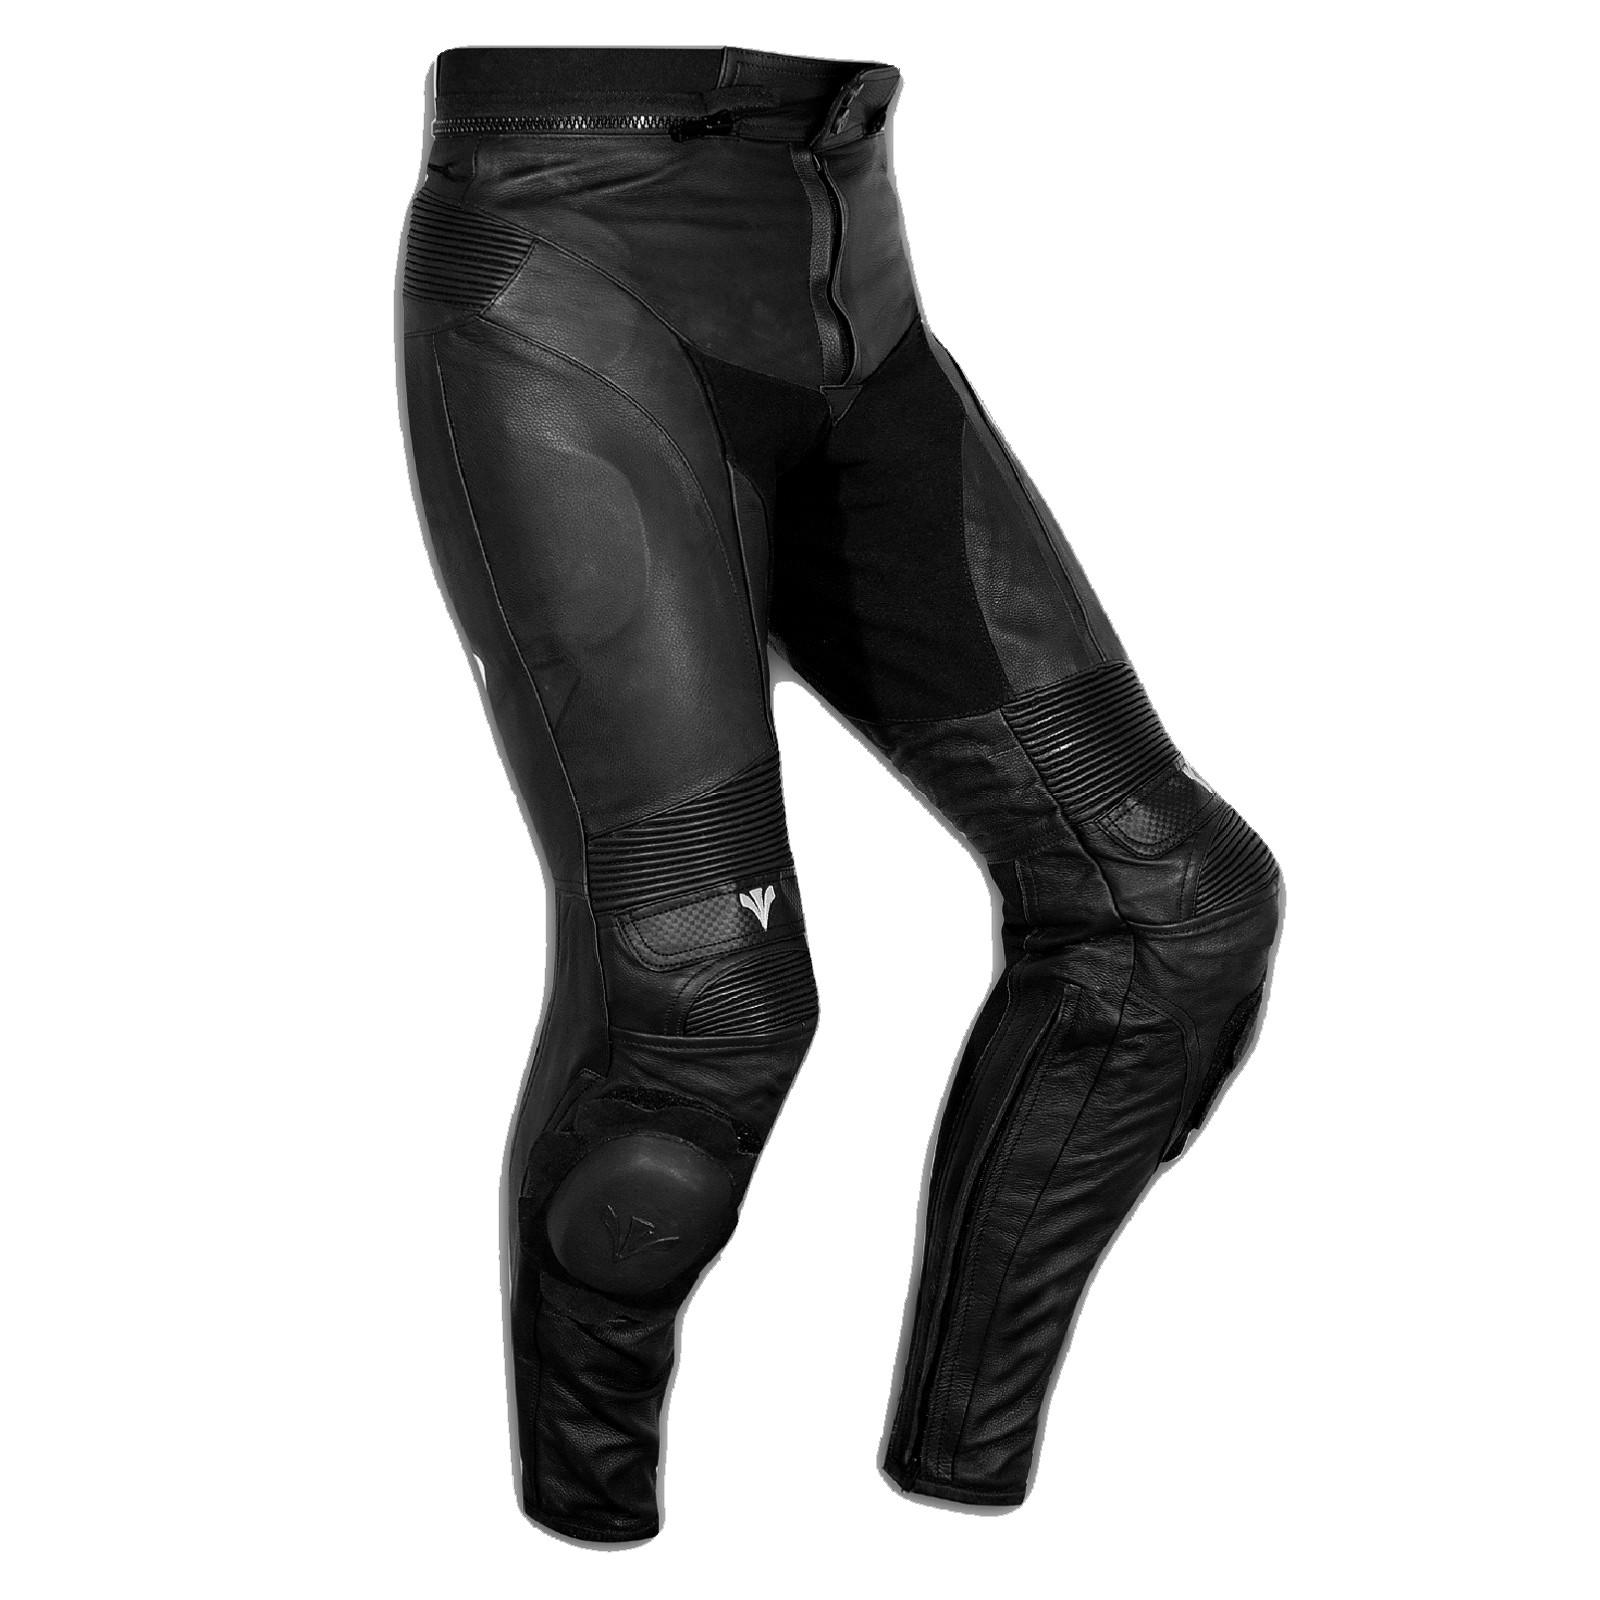 Pantaloni Pelle Sport Moto Naked Protezioni Sliders Sportivo Tecnico Nero